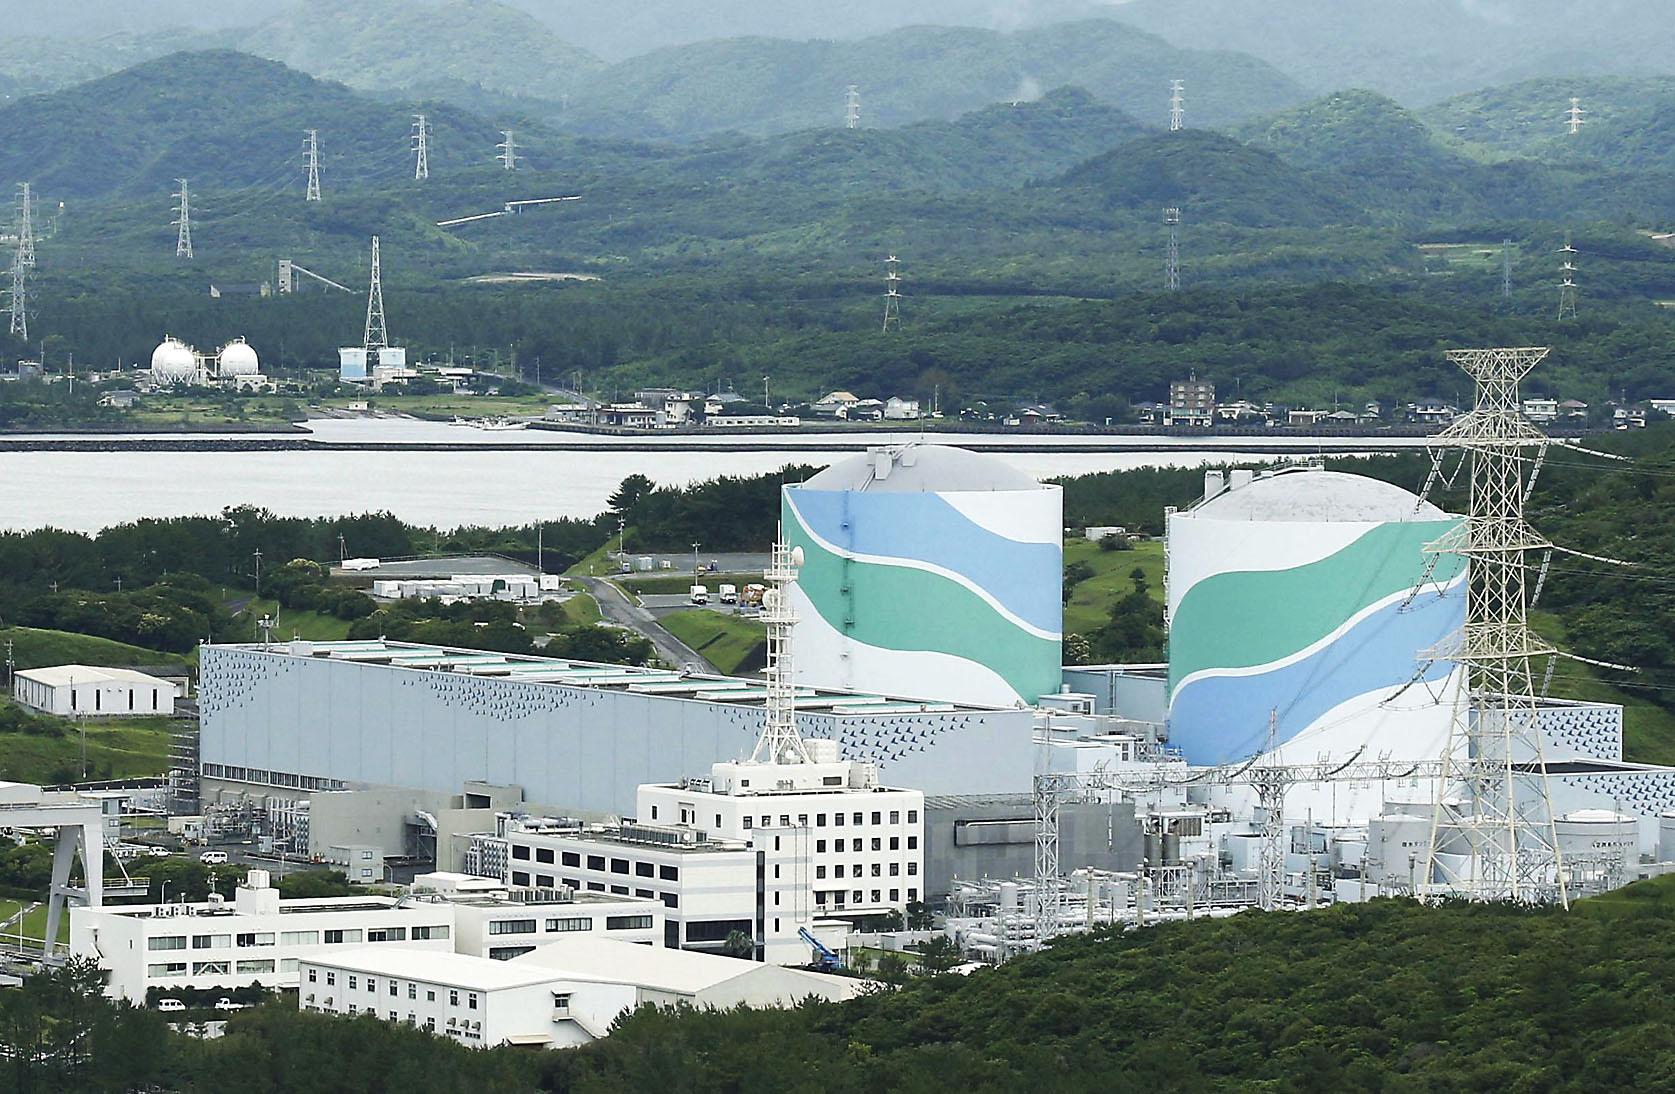 Obnovení komerčního provozu jaderné elektrárny Sendai bylo stanoveno na 10. září